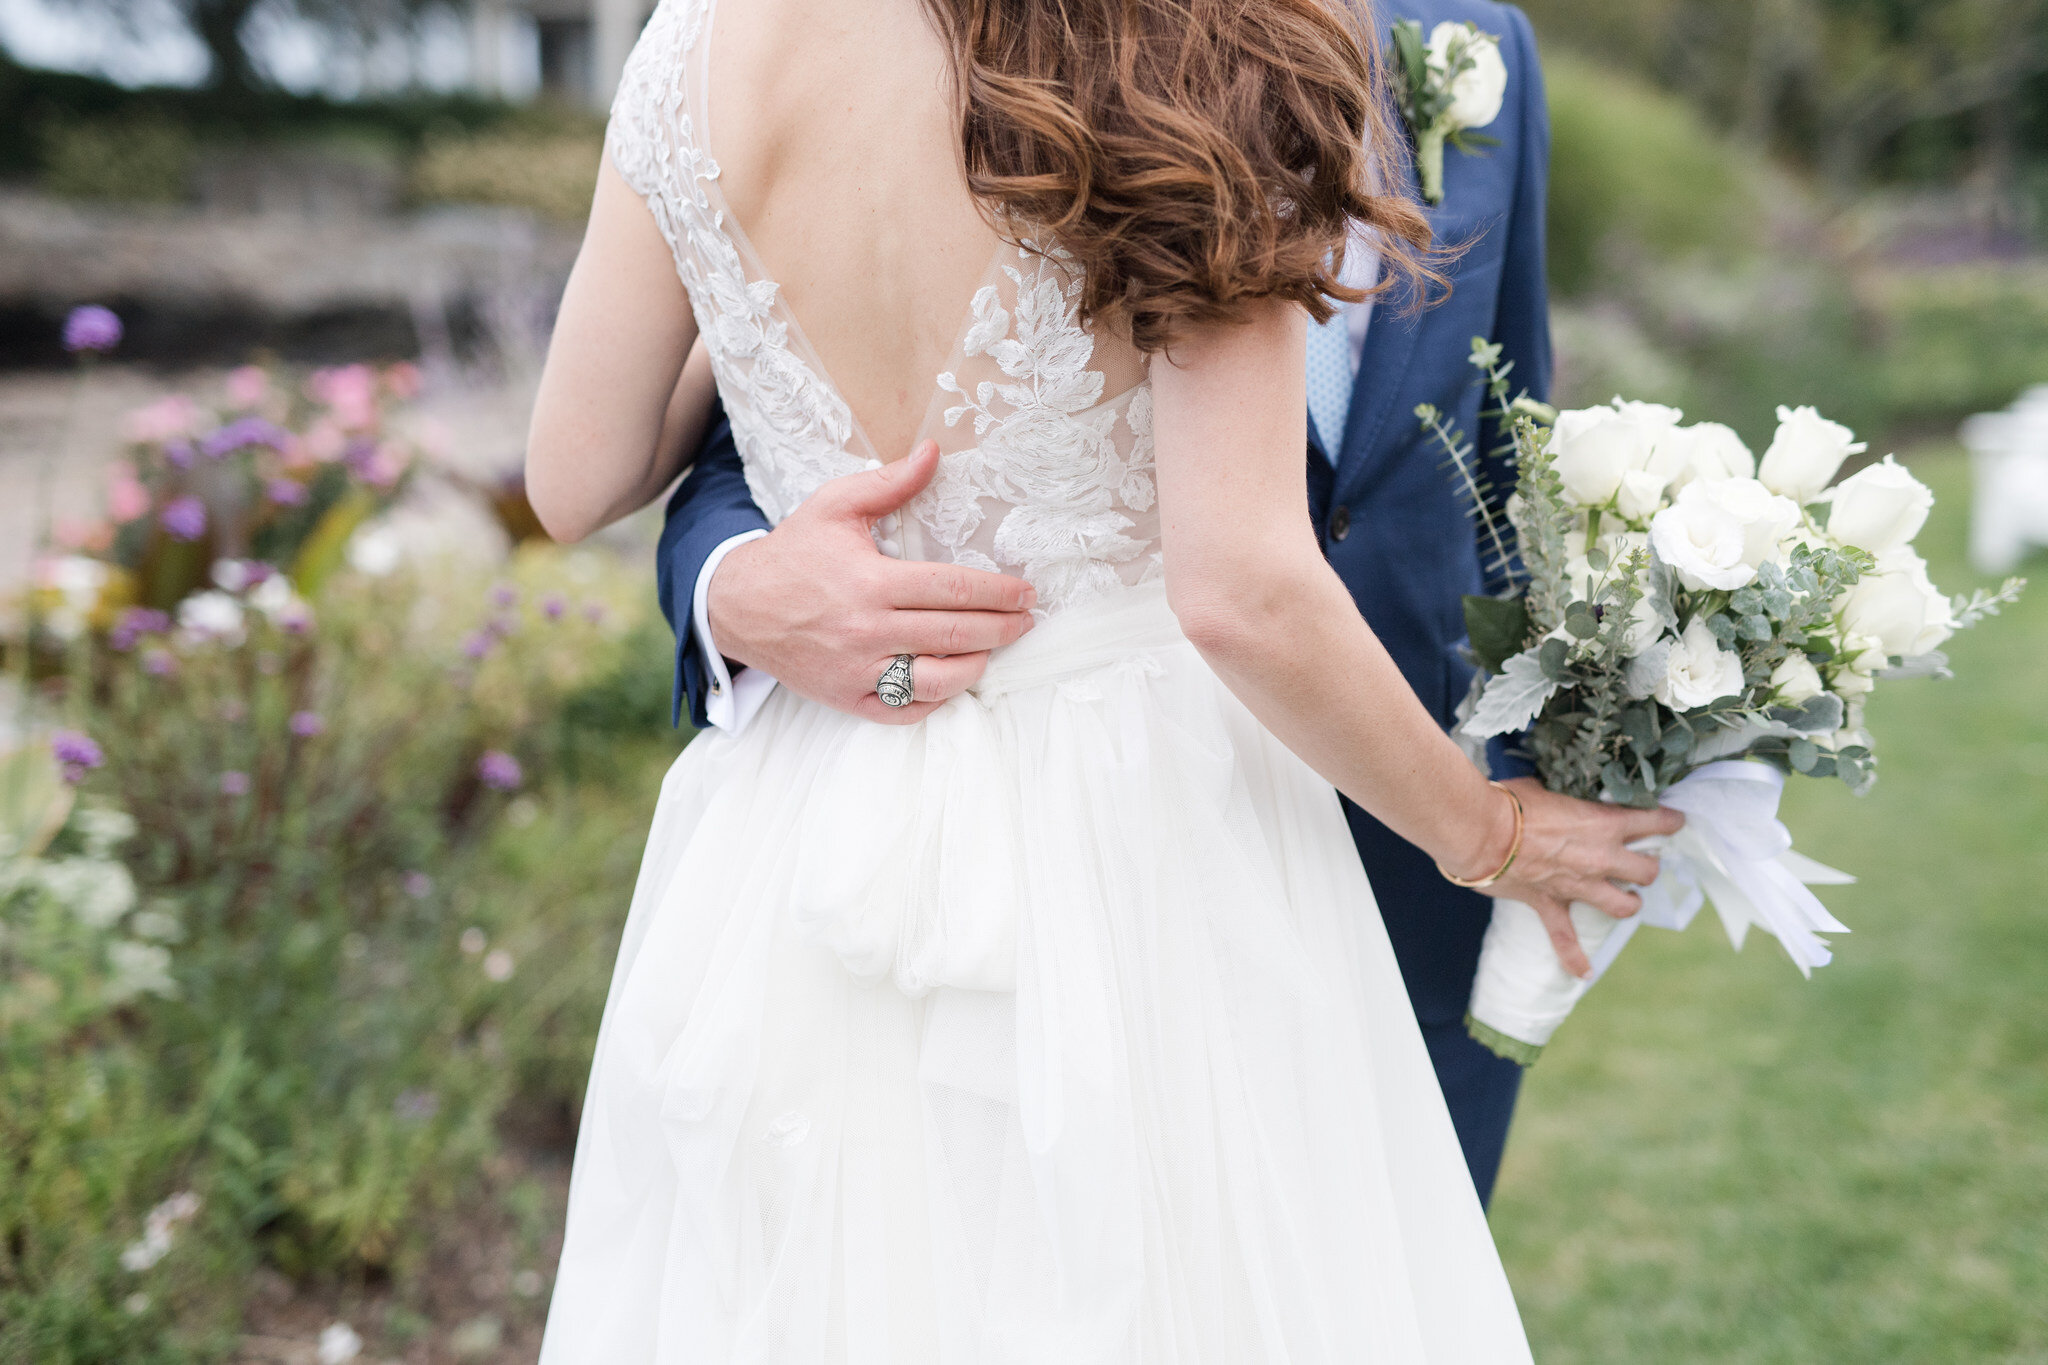 greenwich wedding_belle haven club wedding _ct wedding photographer-41_Easy-Resize.com.jpg